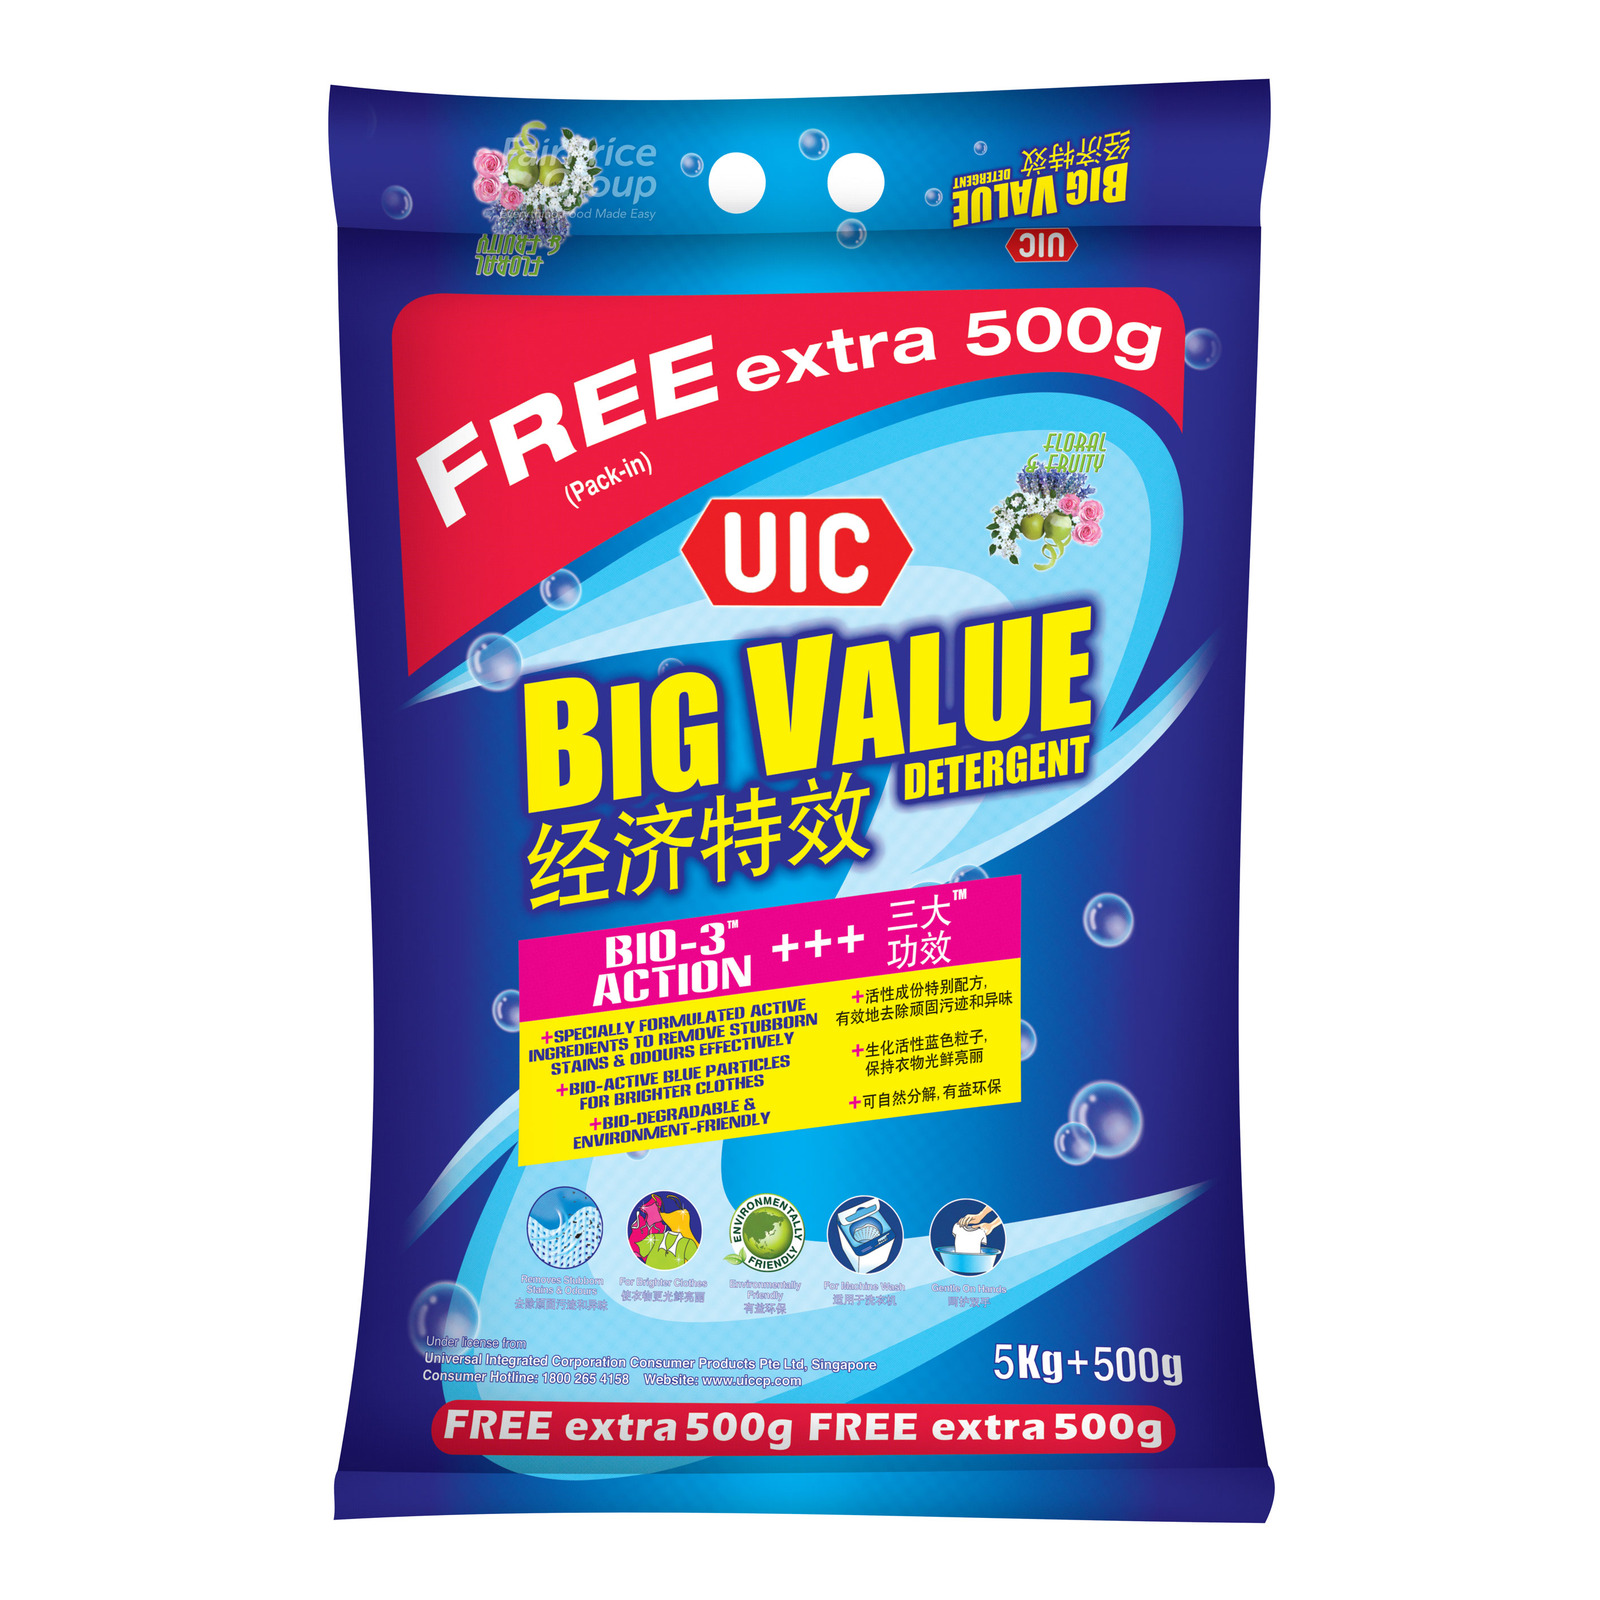 UIC Big Value Detergent Powder - Regular(FloralFruity)